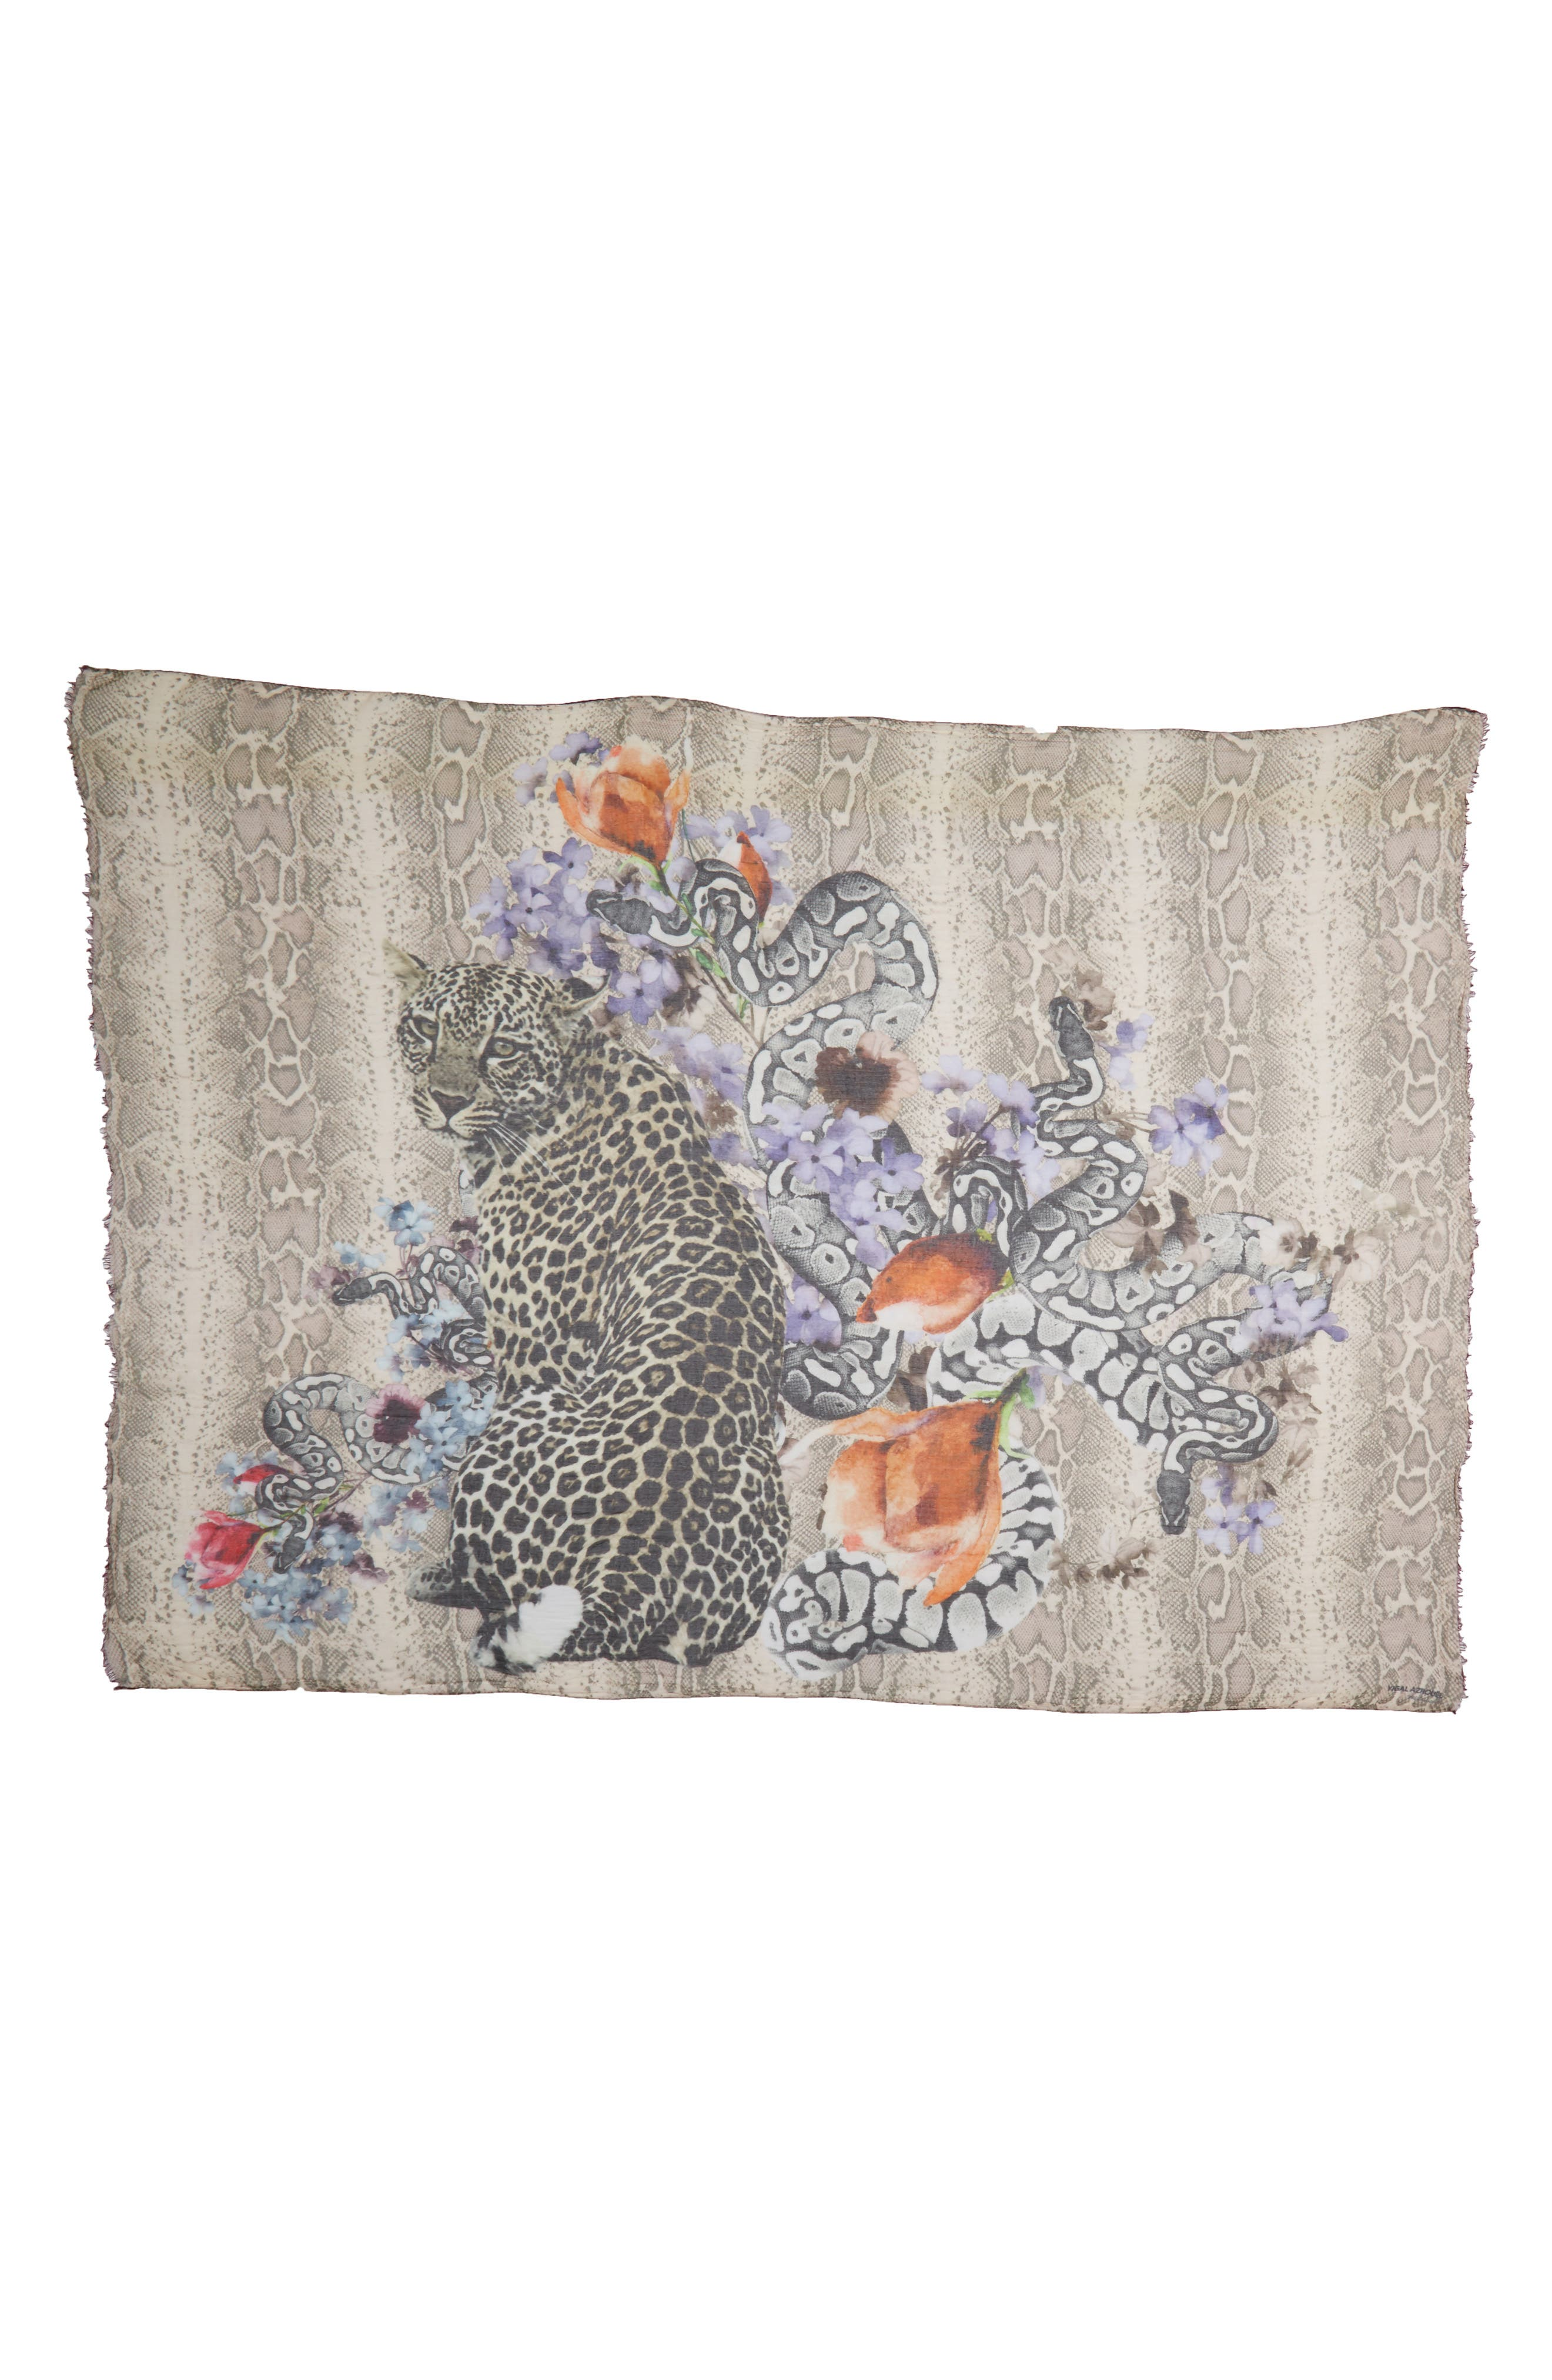 Main Image - Yigal Azrouël Floral Cheetah Modal & Cashmere Scarf